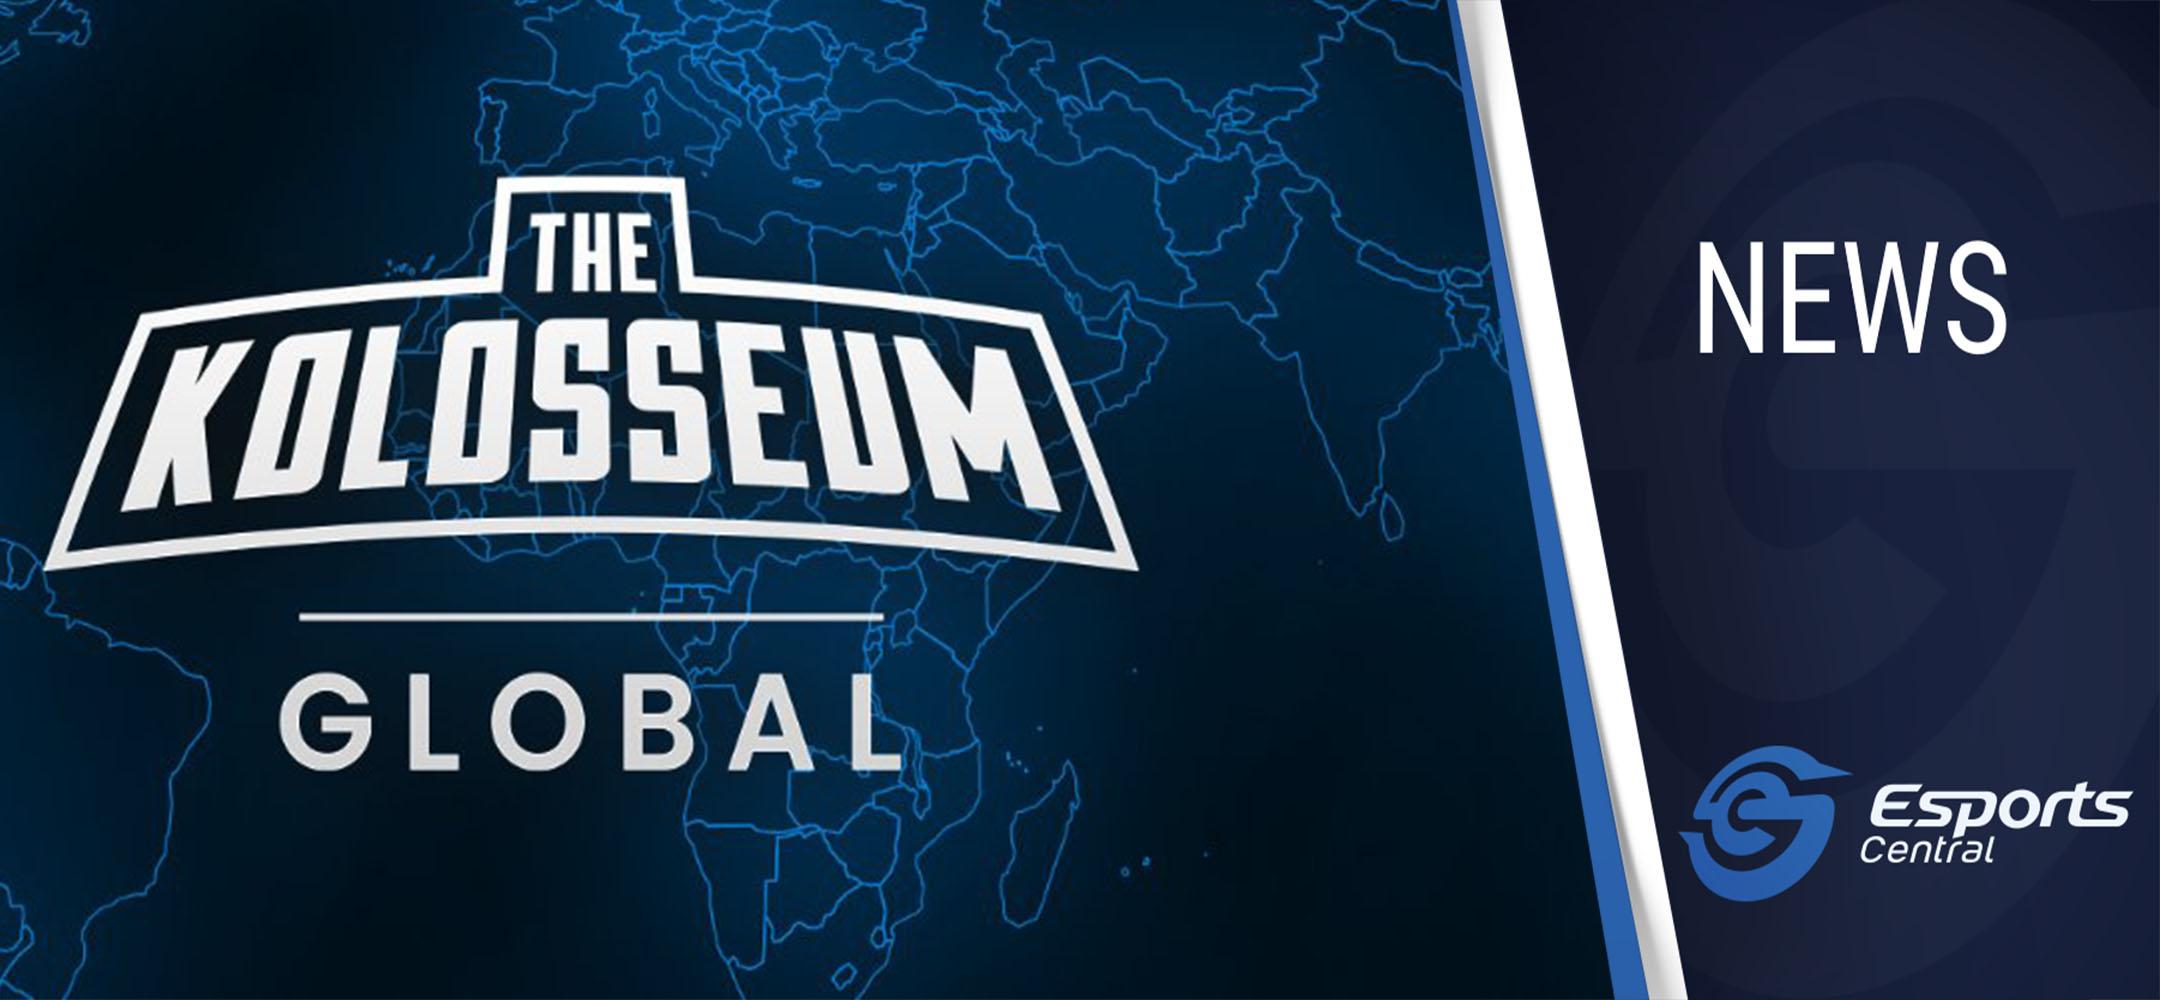 The kolosseum